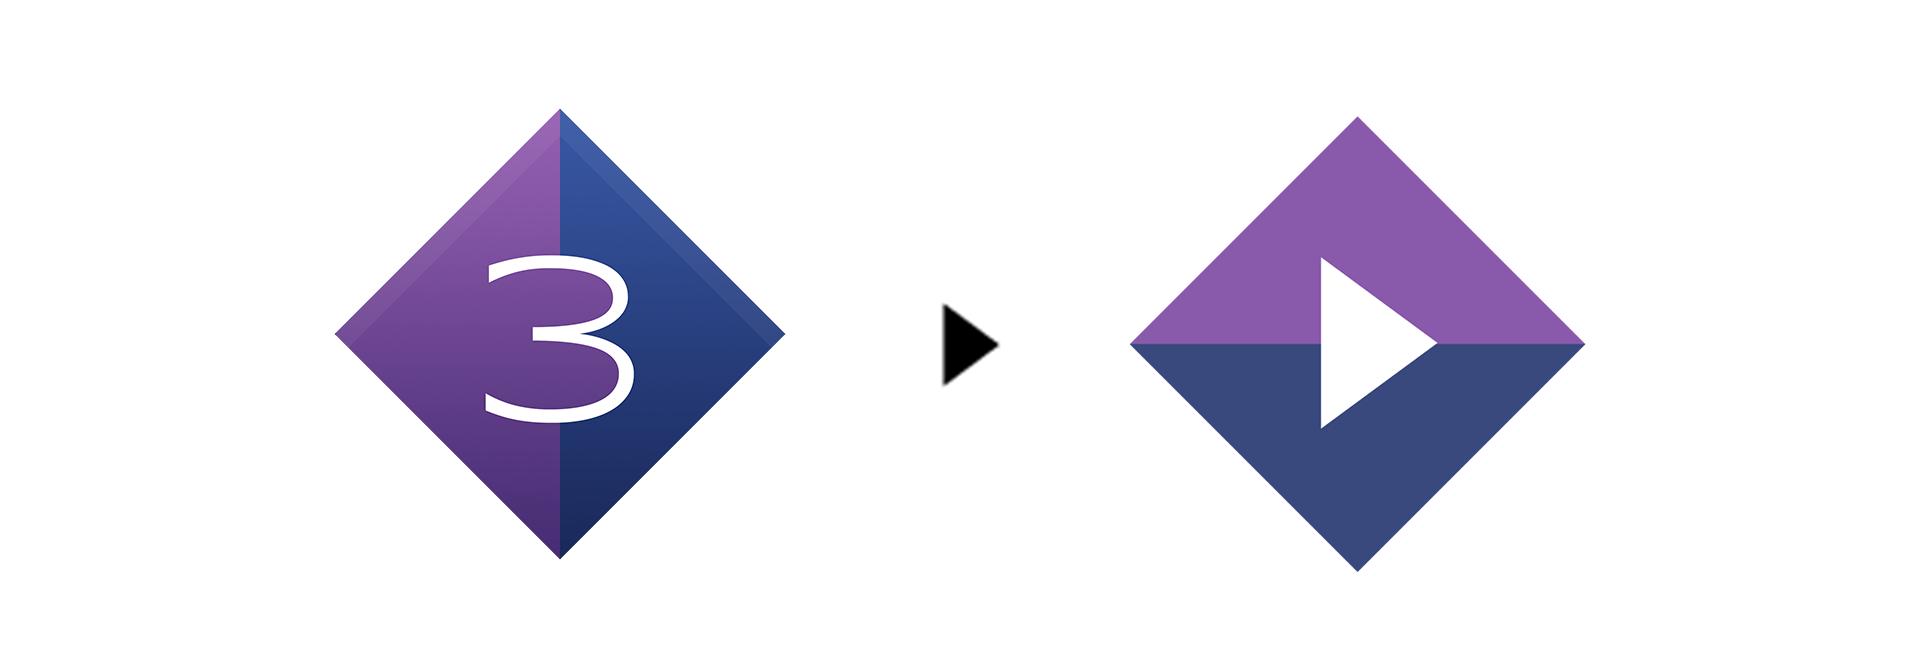 Stremio rebranding | The Stremio Blog